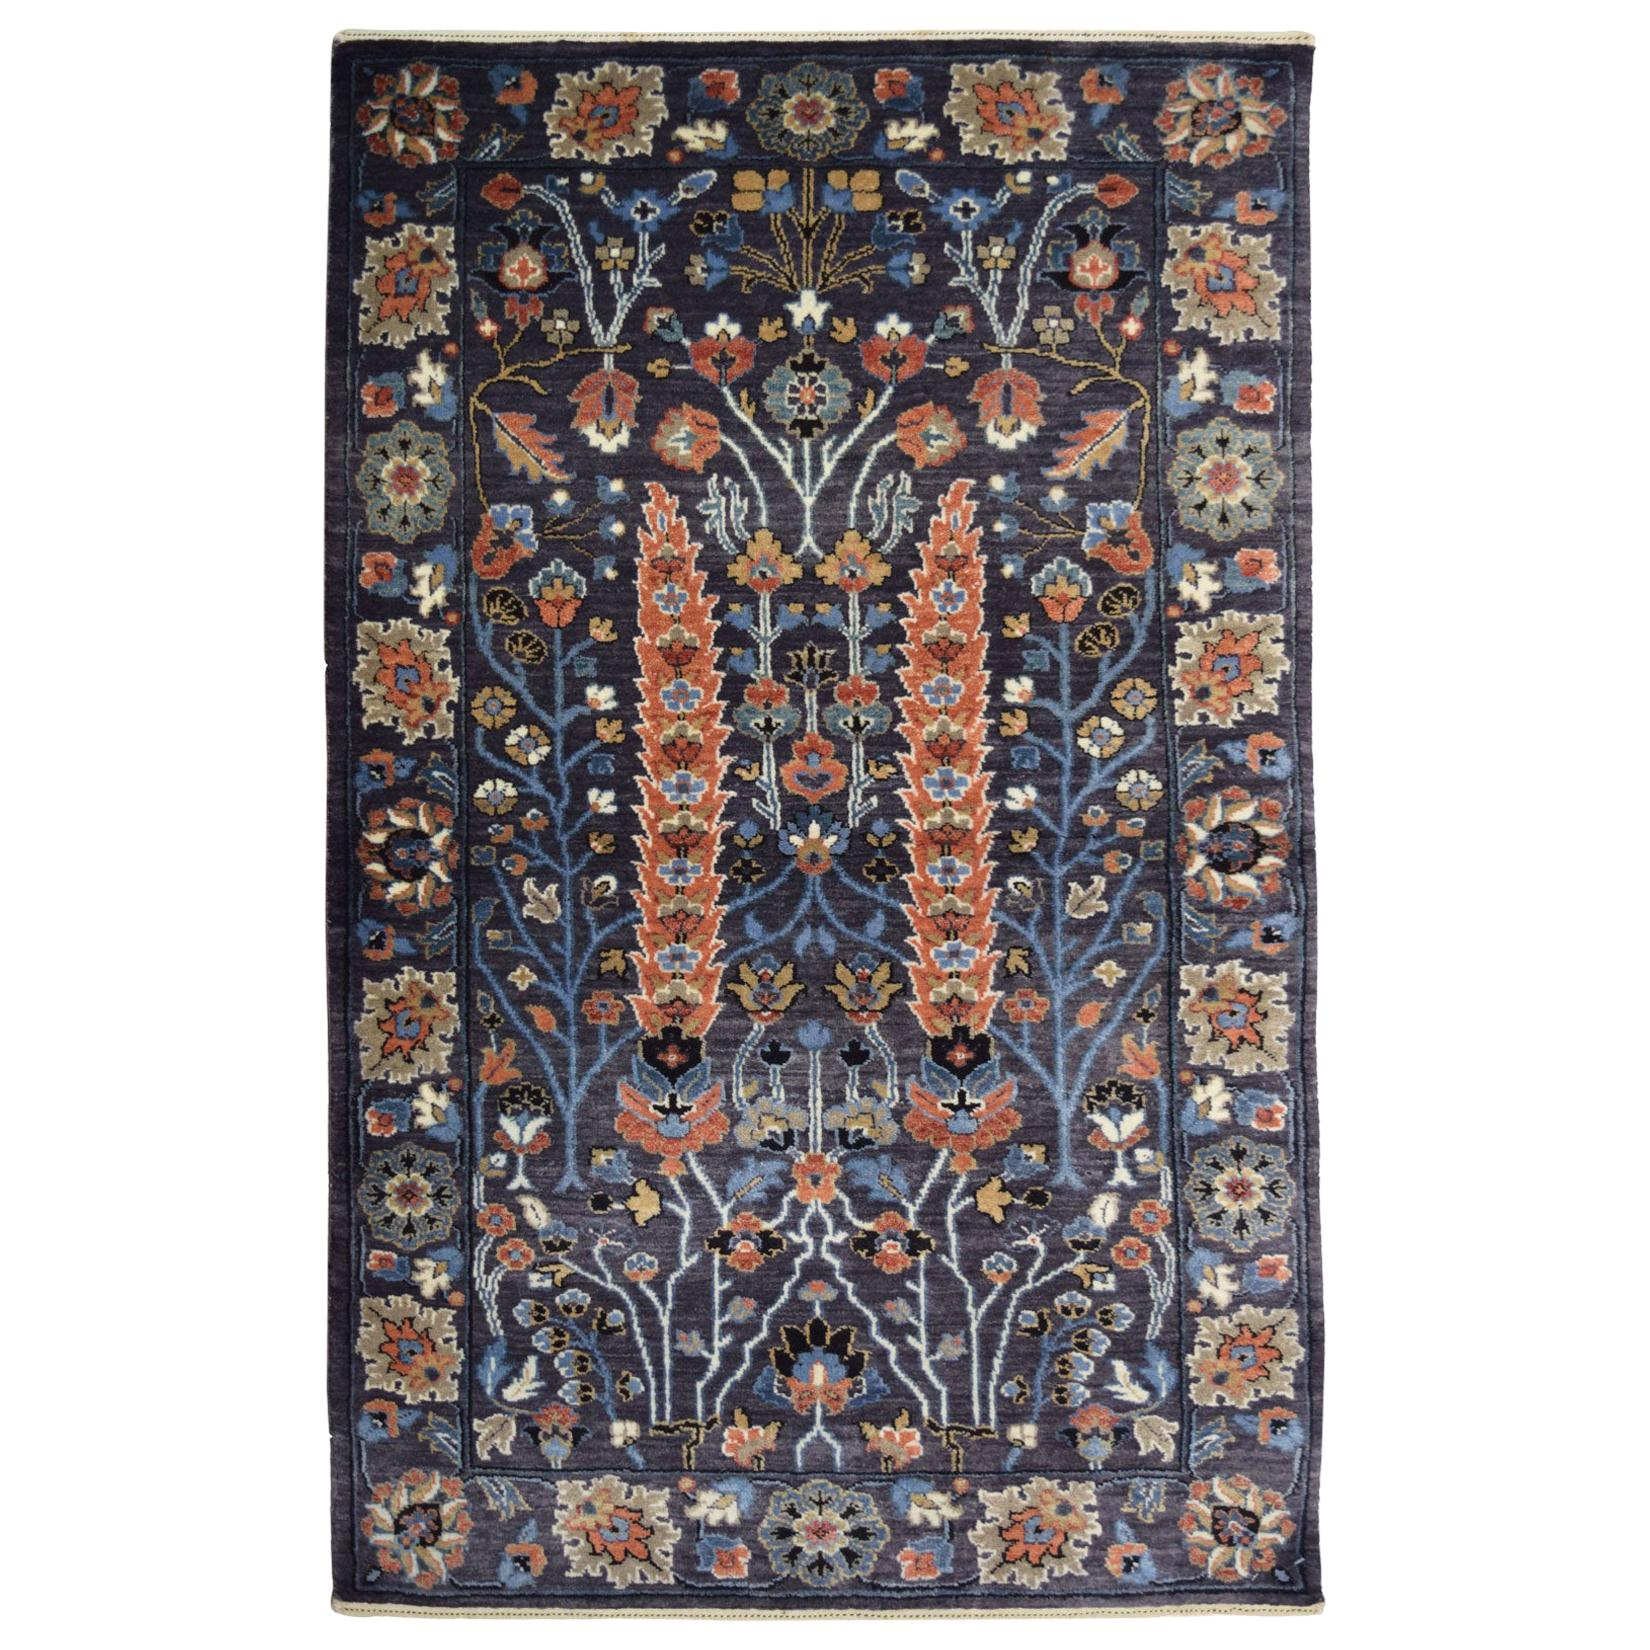 Modern Persian Inspired Bakshayesh Carpet in Blue, Orange, Cream, and Green Wool